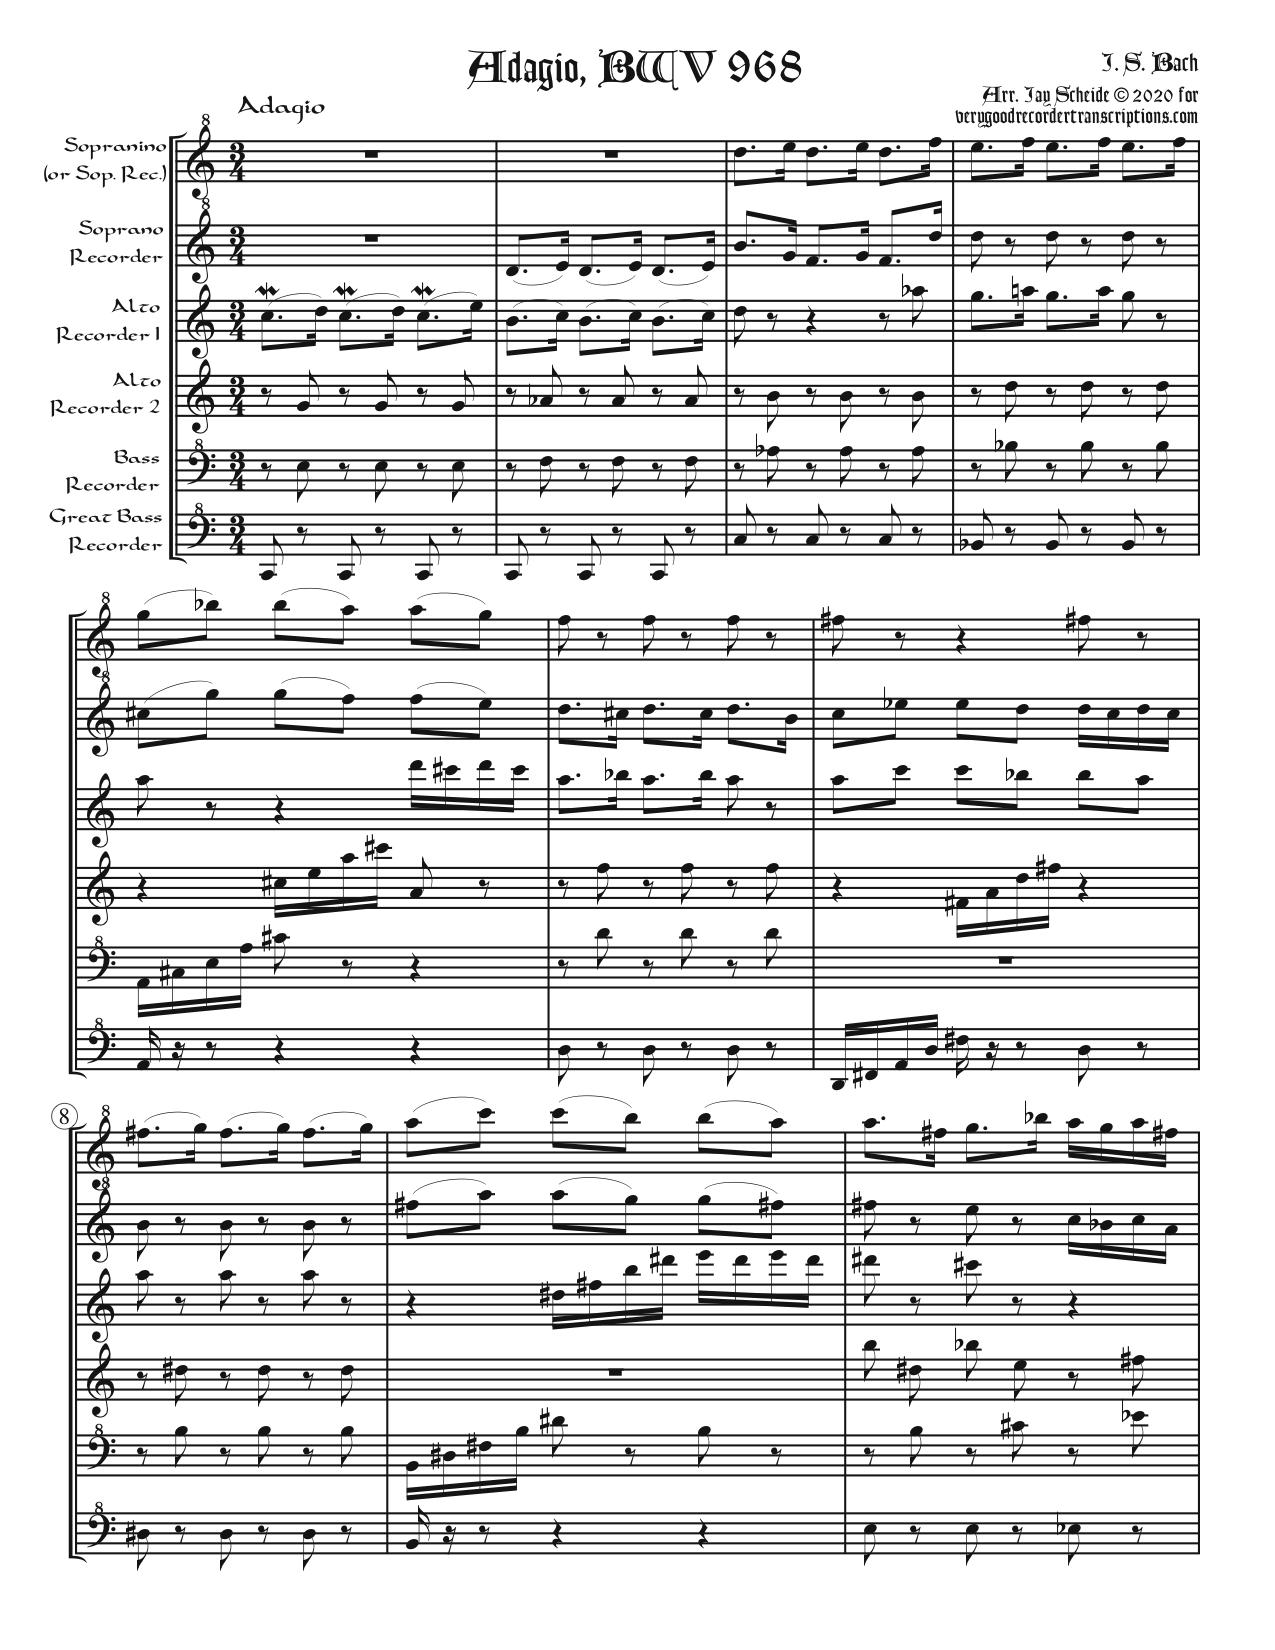 Adagio, BWV 968, arr. for recorder sextet